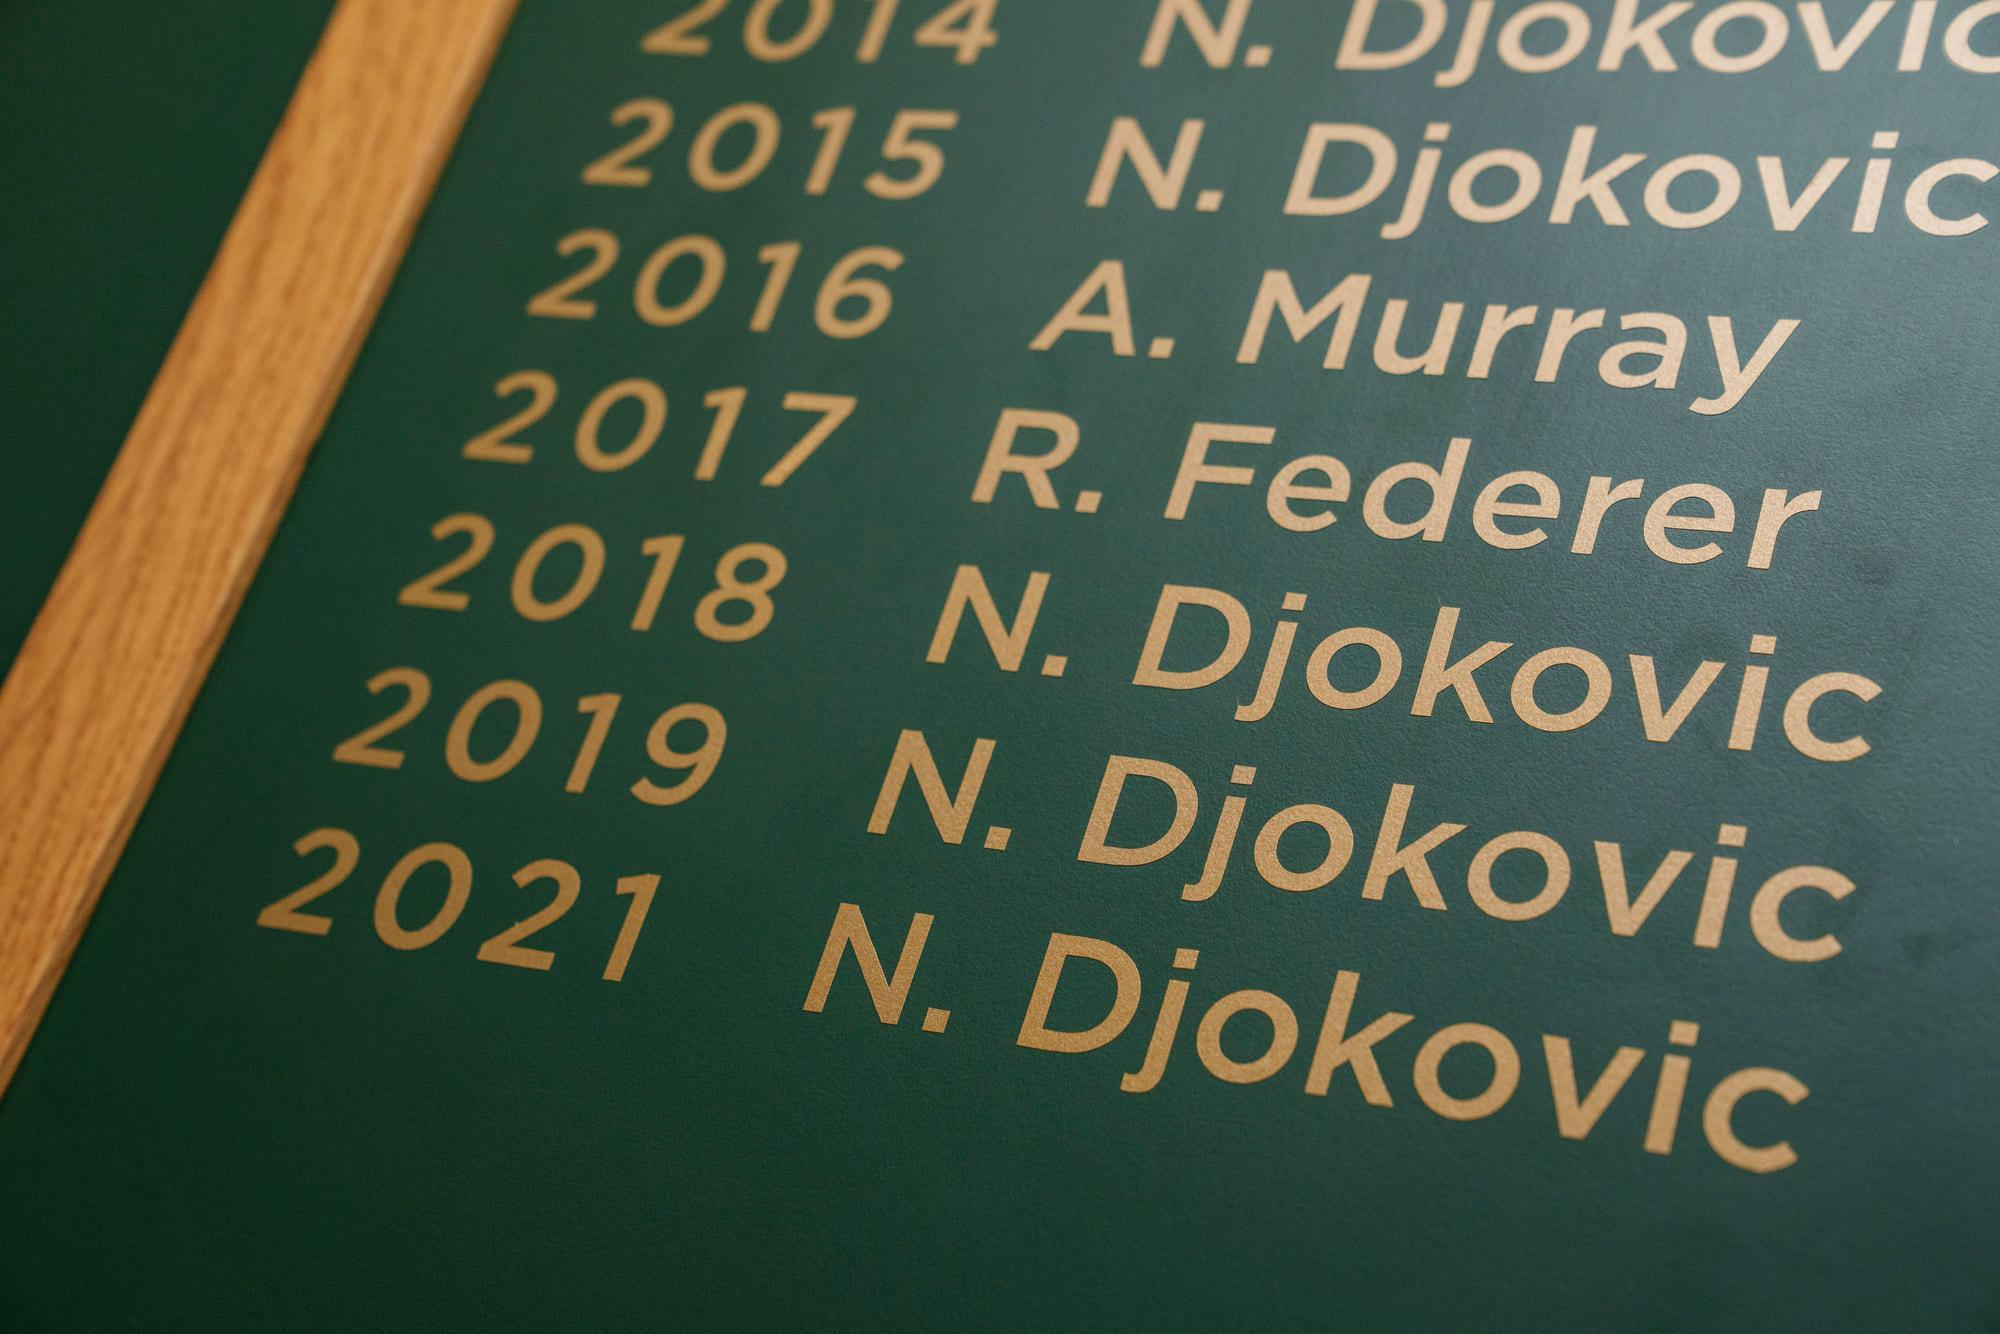 178040253 10158539452513732 3006014848098067964 n - Dva dvoboja na minulem Grand Slamu v Wimbledonu pod preiskavo zaradi sumljivih stavnih vzorcev